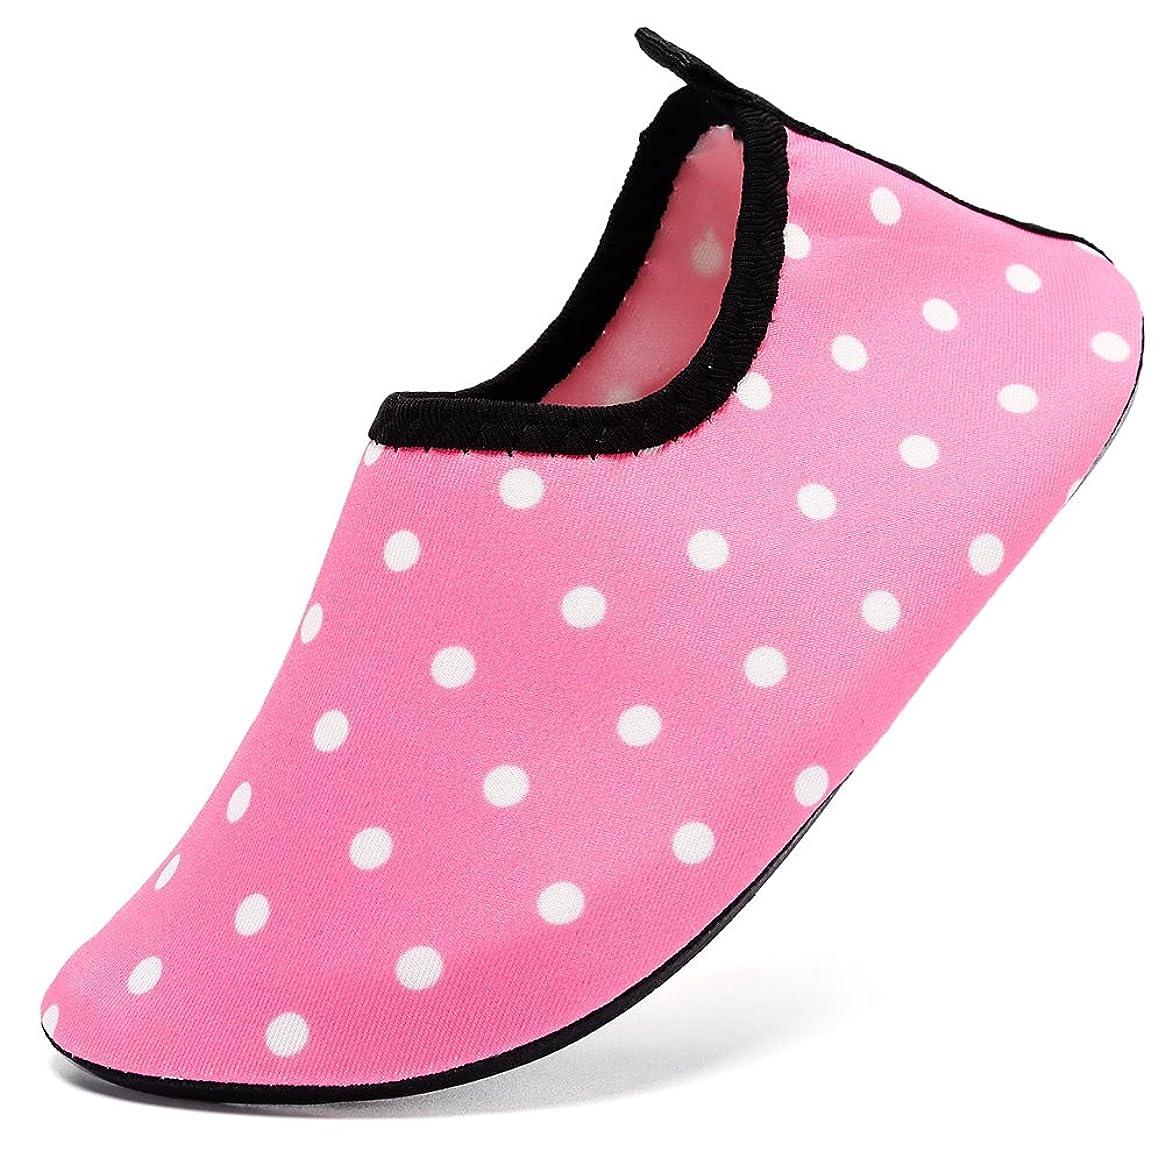 CIOR Women Quick-Dry Water Sports Kid's Aqua Swimming Shoes Socks for Men